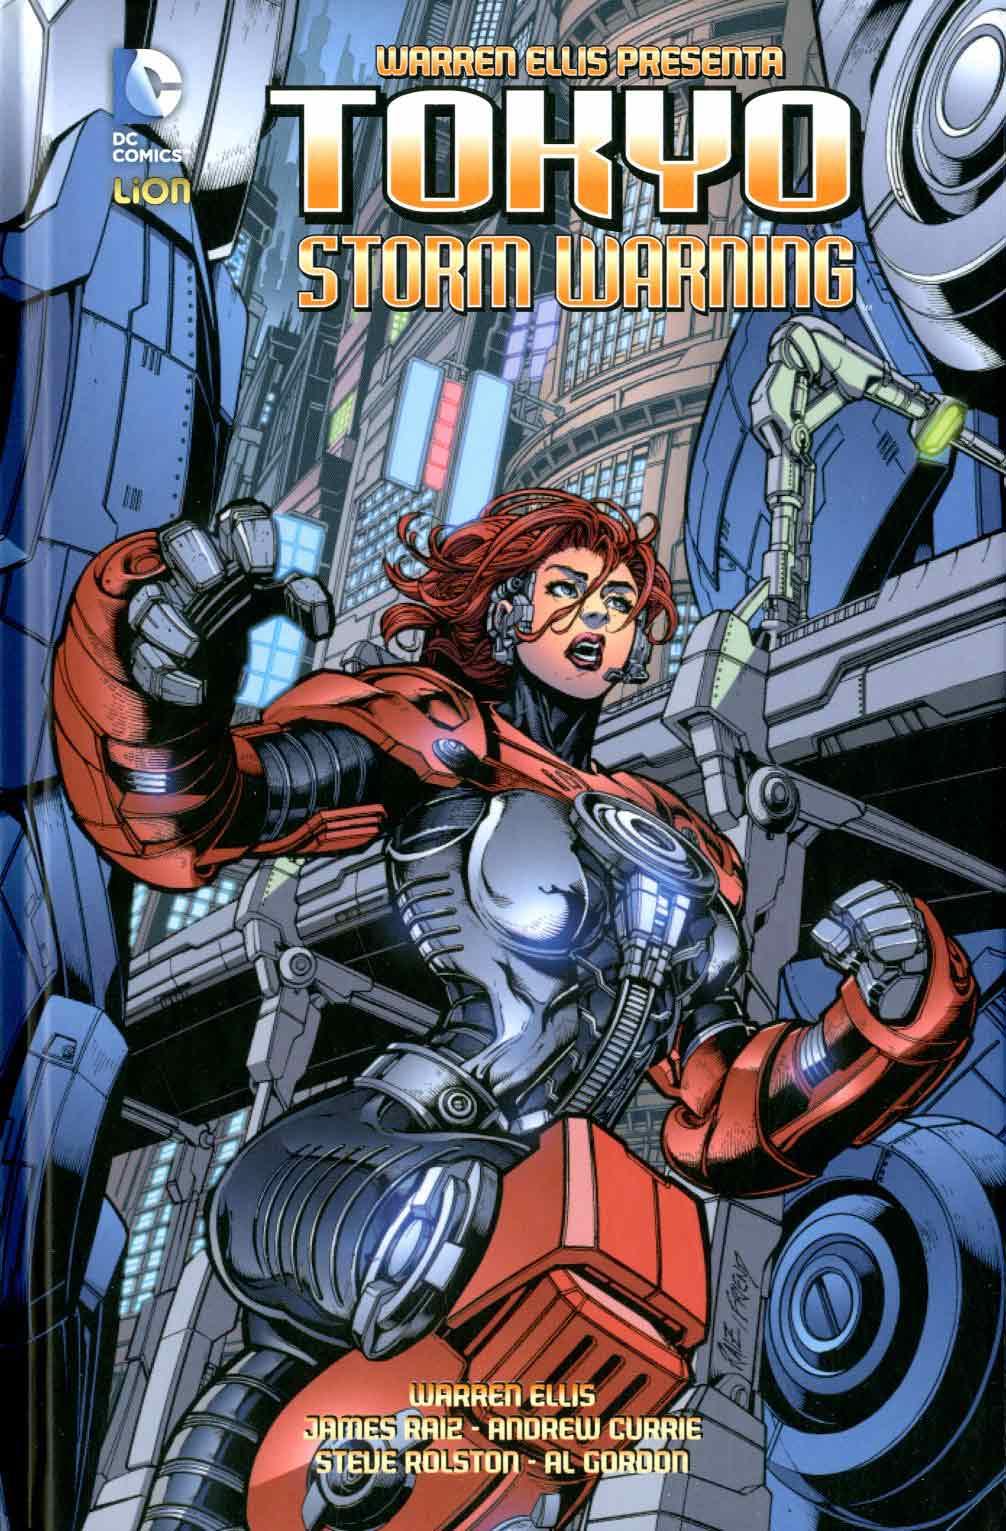 Grandi Opere DC - Warren Ellis presenta: Tokyo Storm Warning/MEK